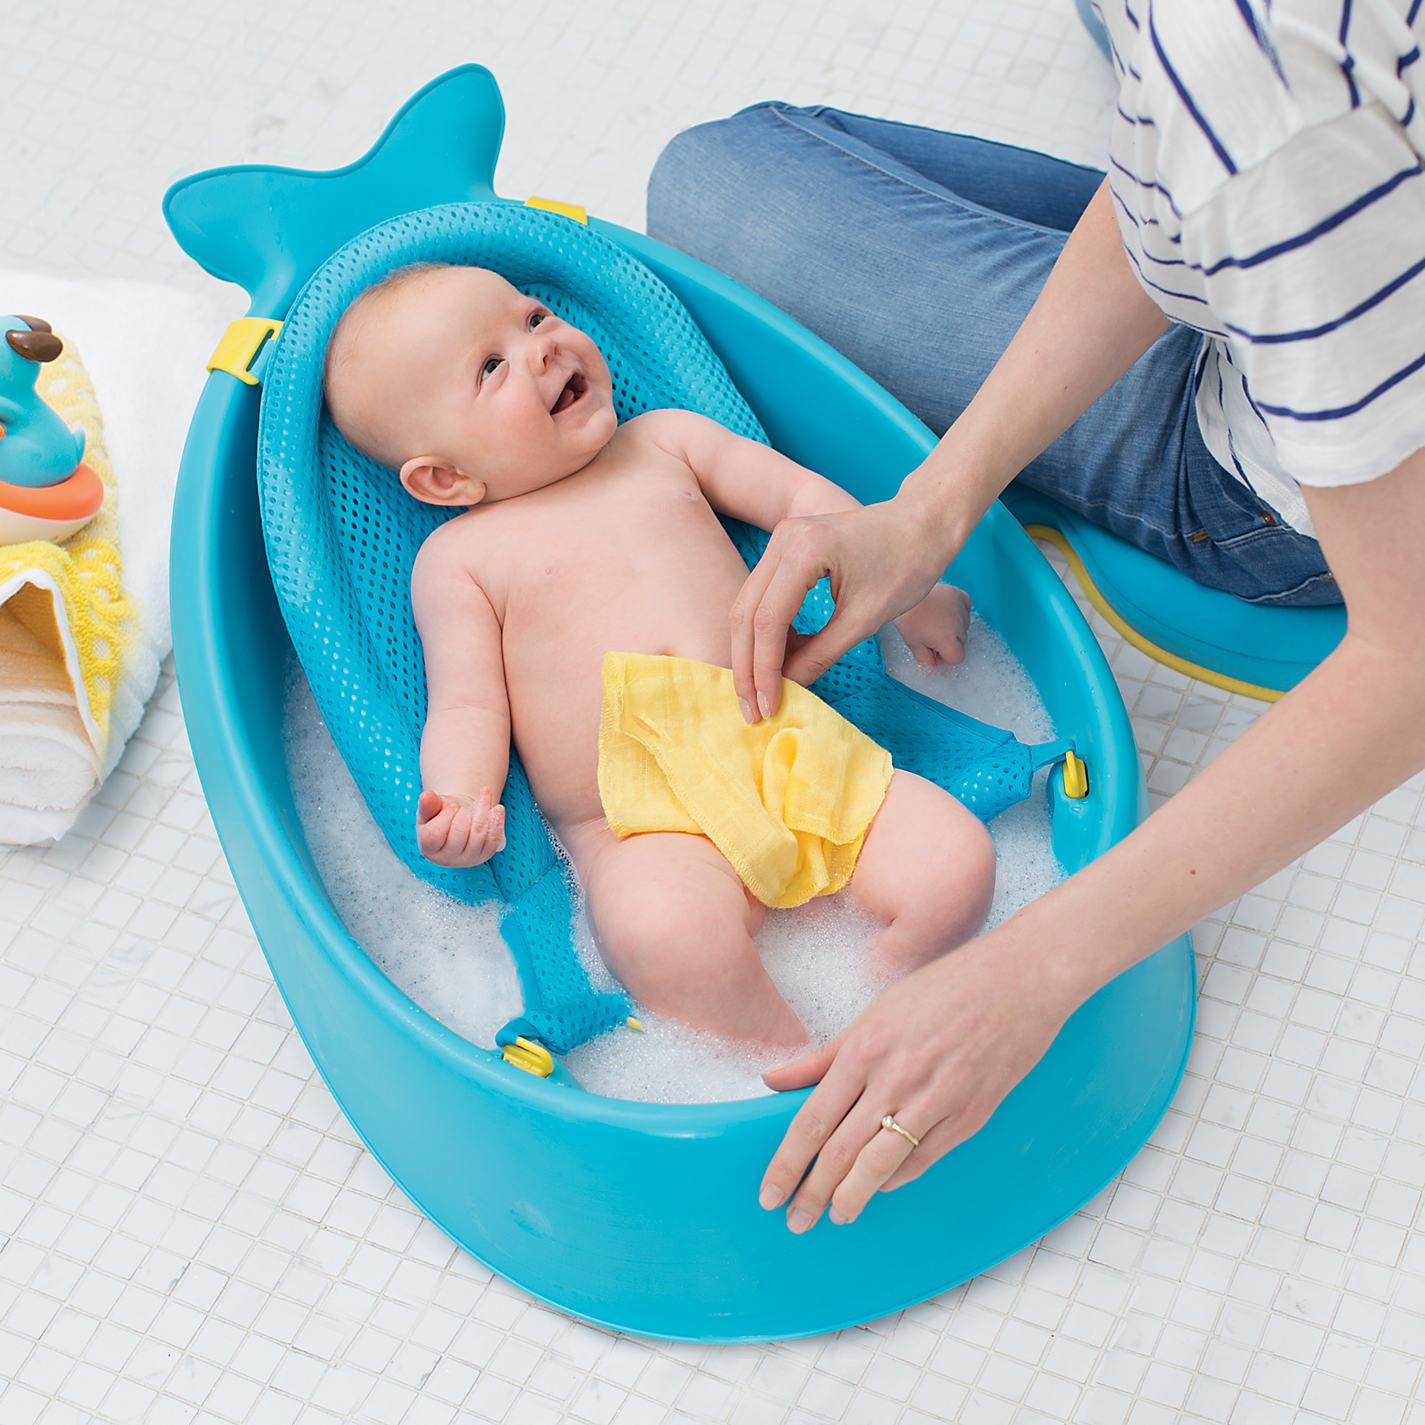 Buy Skip Hop Moby 3 Stage Baby Bath Tub | John Lewis